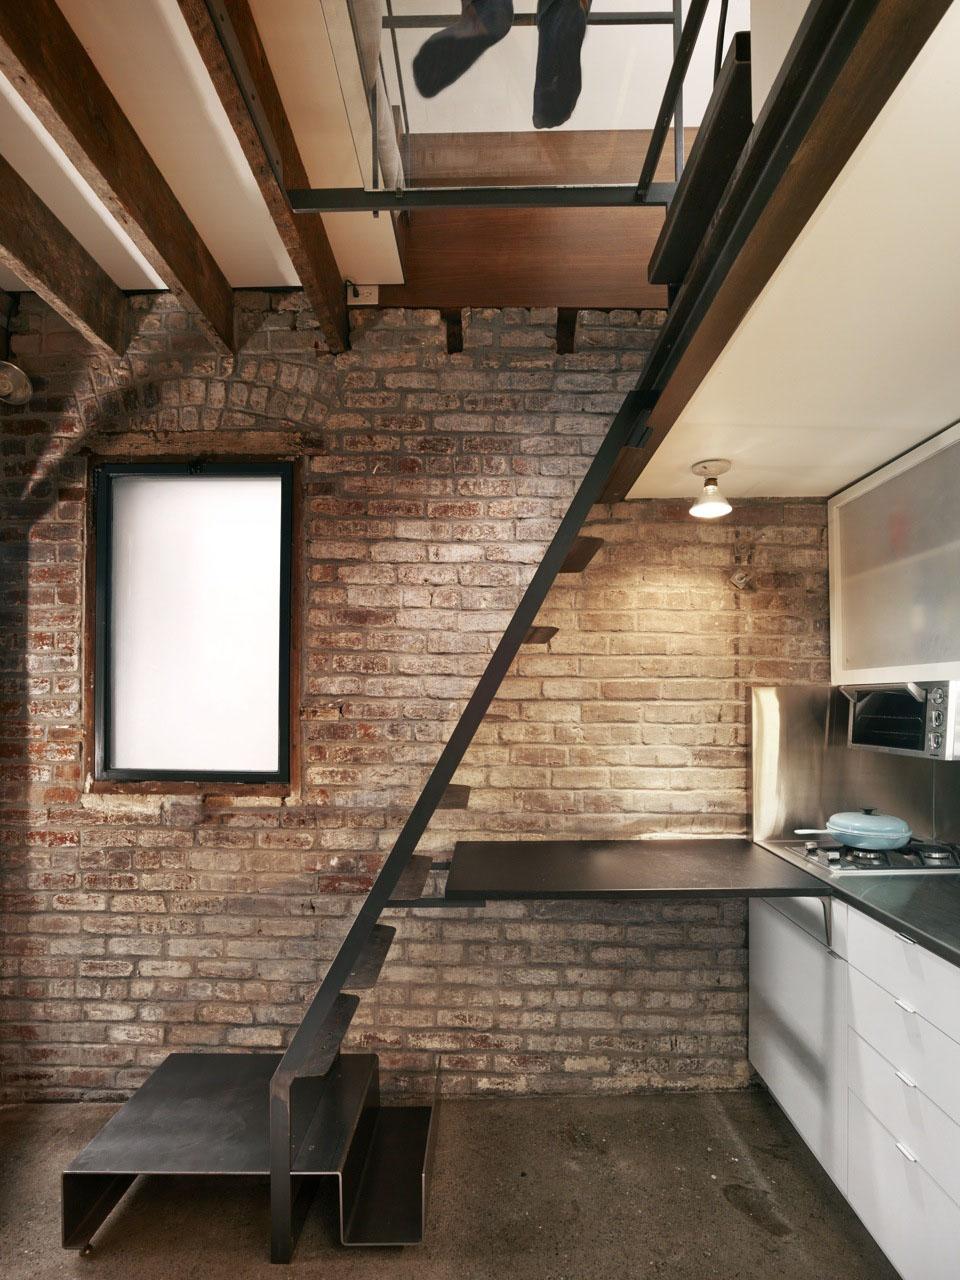 160 Square Foot Micro Apartment In A Tiny Brick House Idesignarch Interior Design